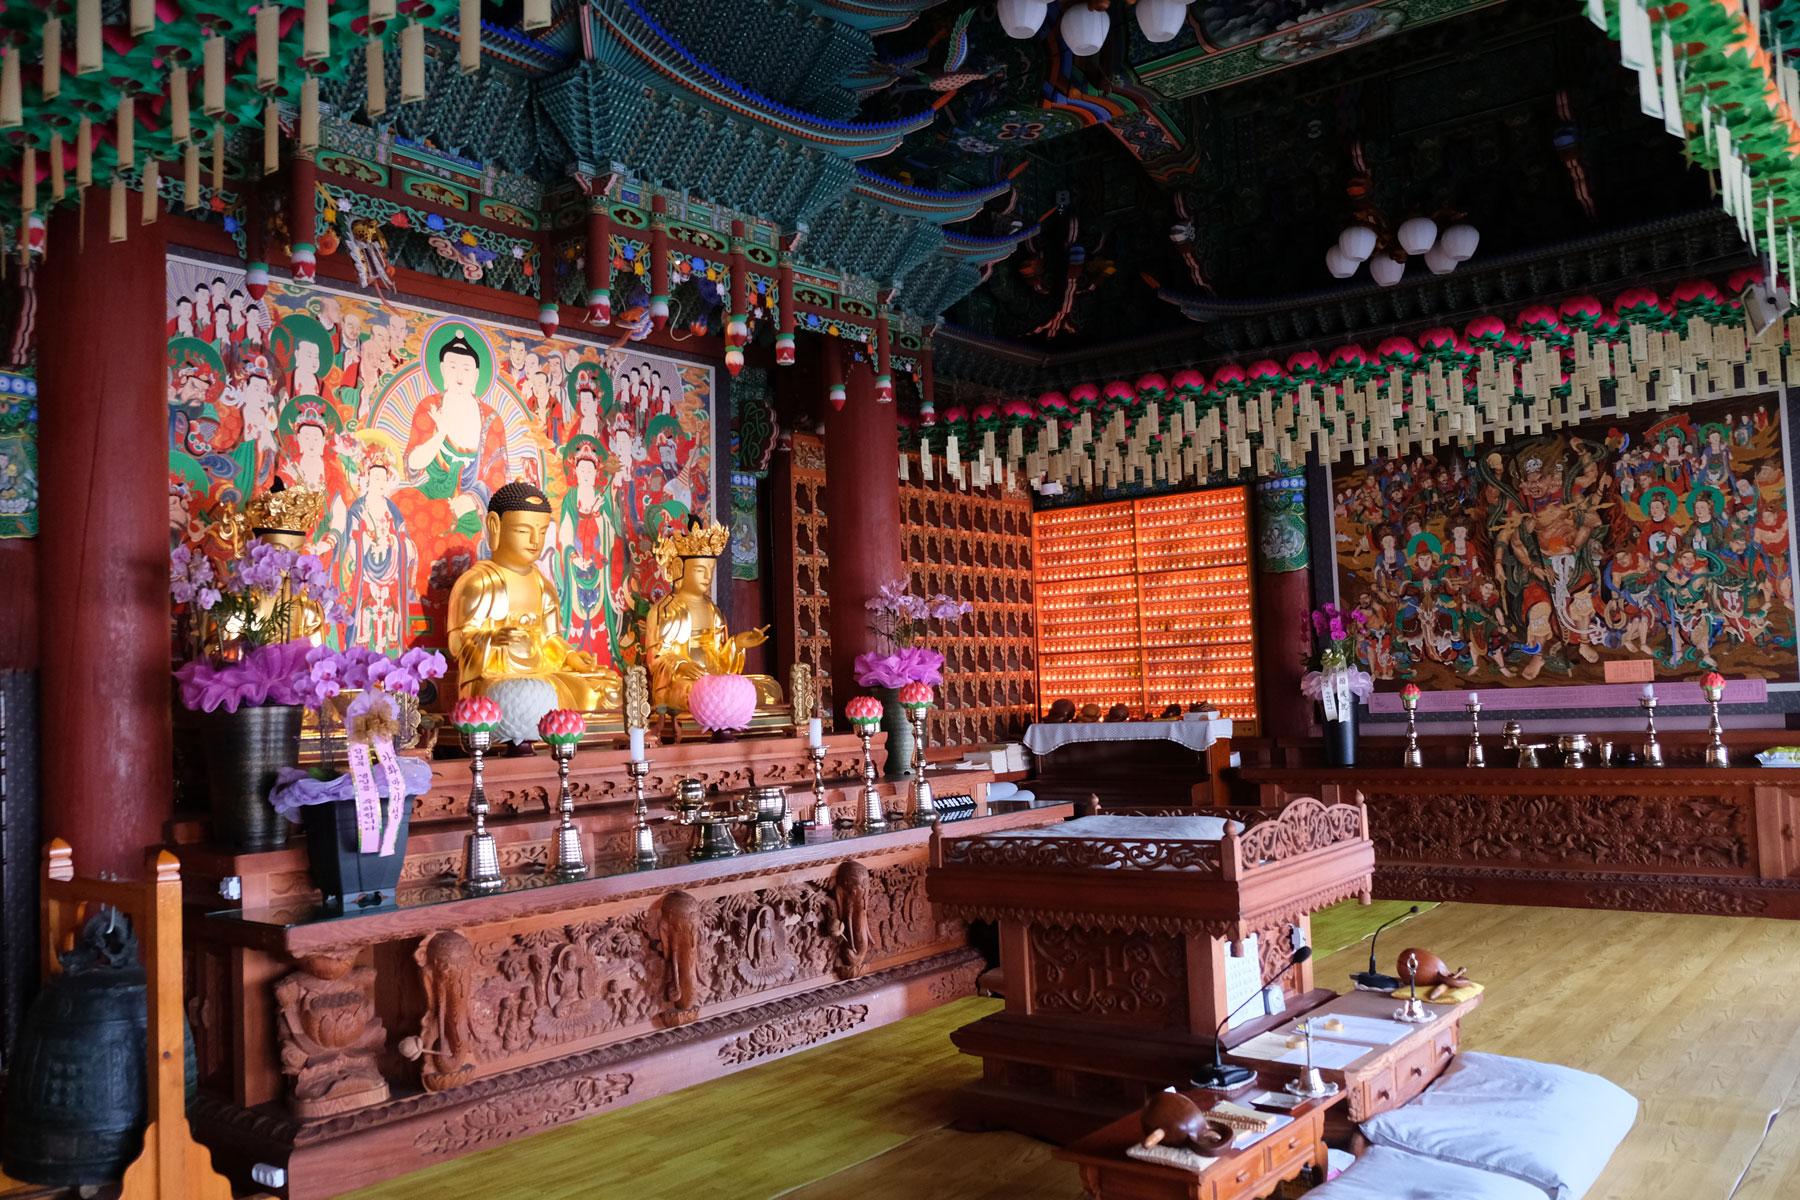 Ein Kloster am Jukgyo-dong-Berg in Mokpo, Südkorea.